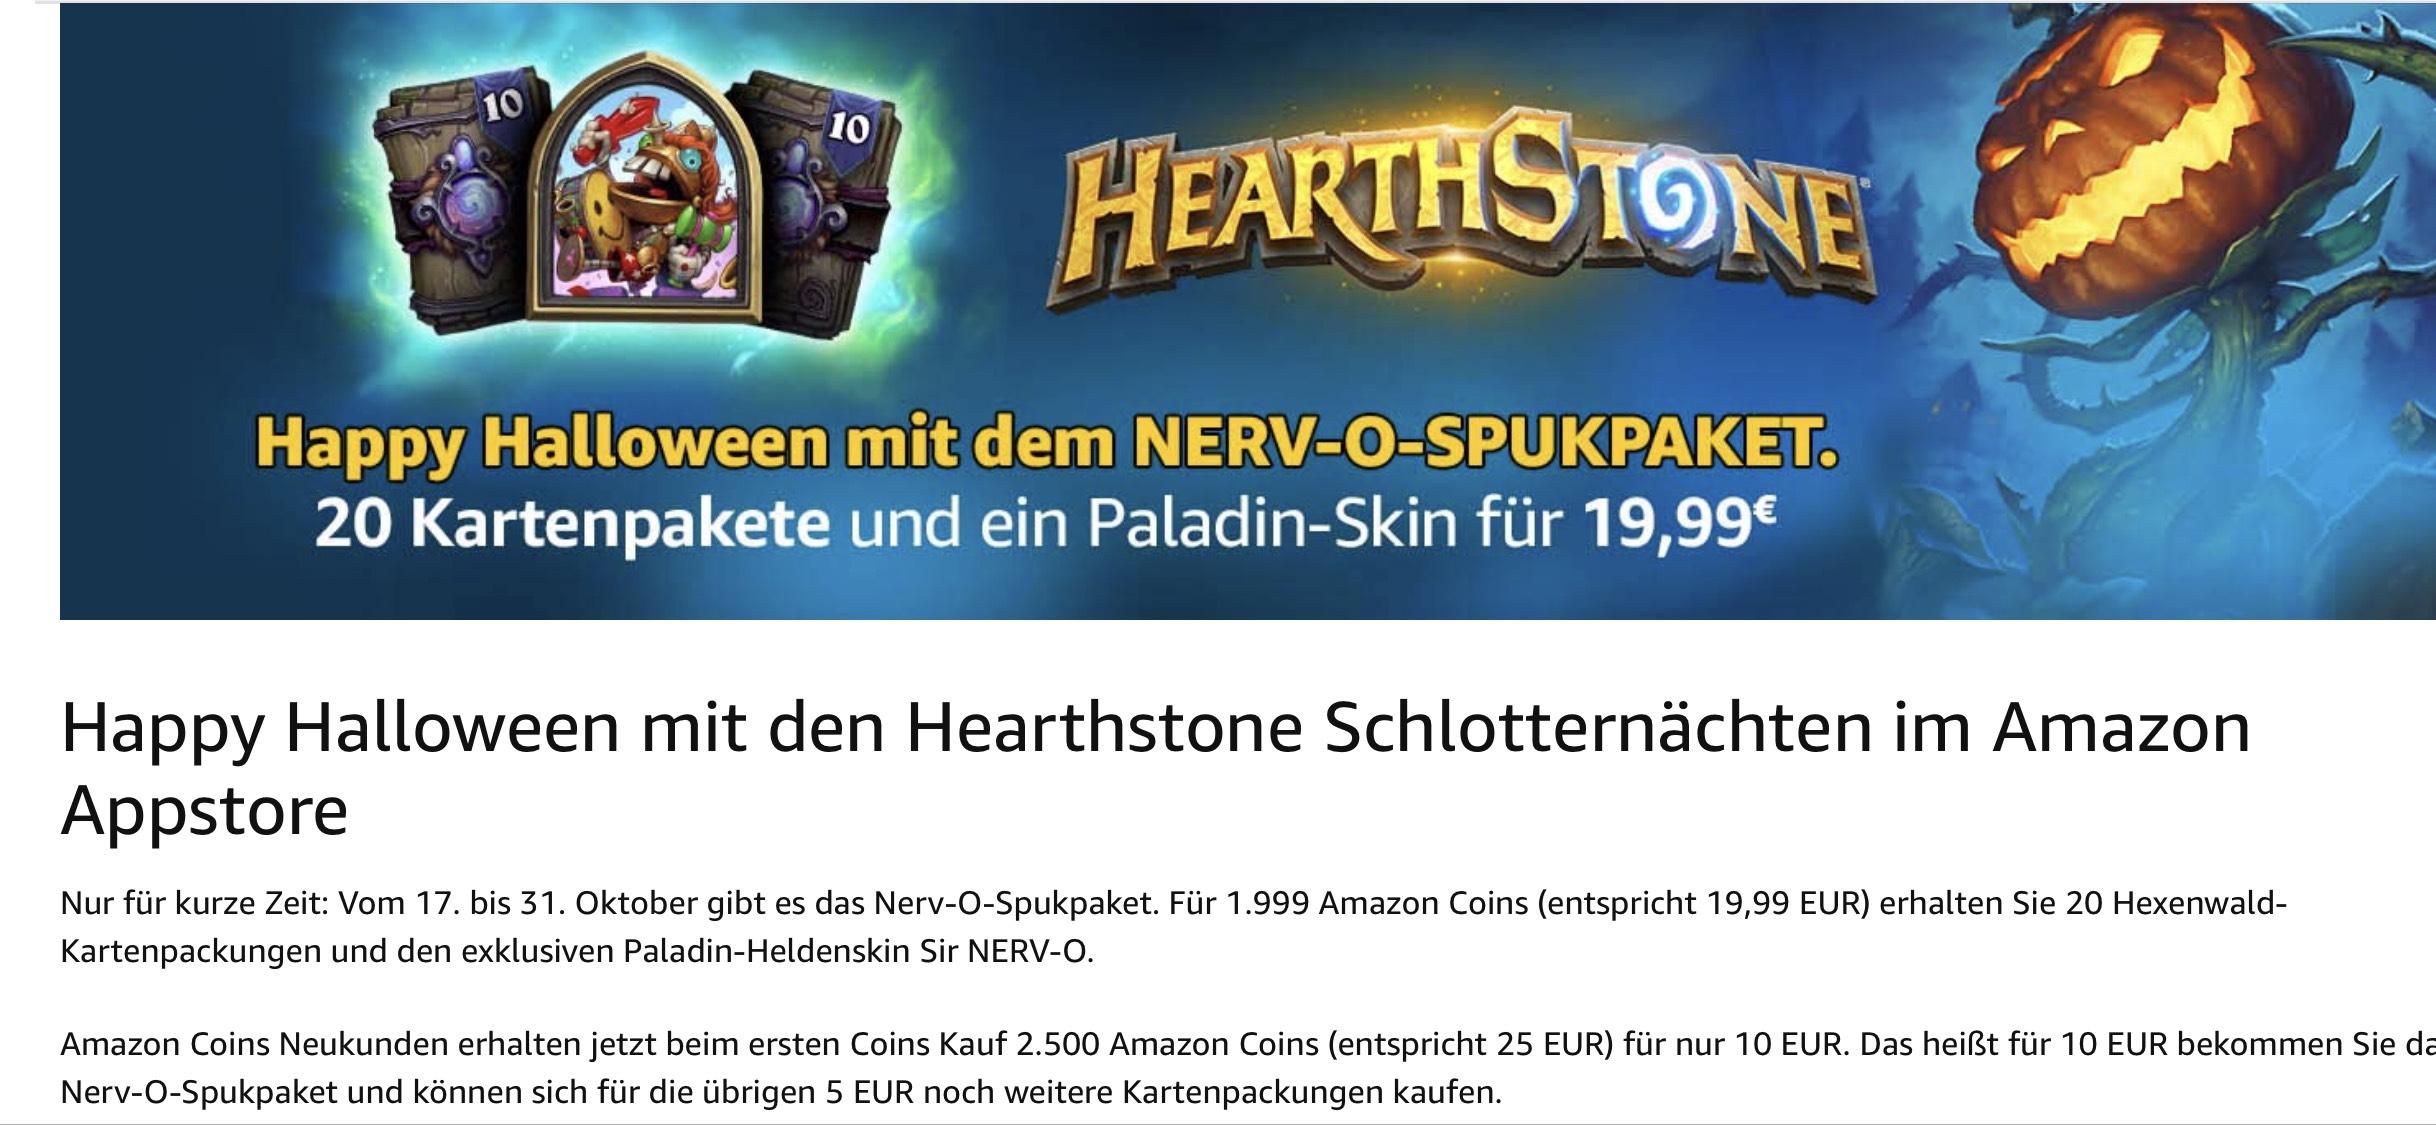 [Neukunde] Amazon 2.500 Coins Hearthstone